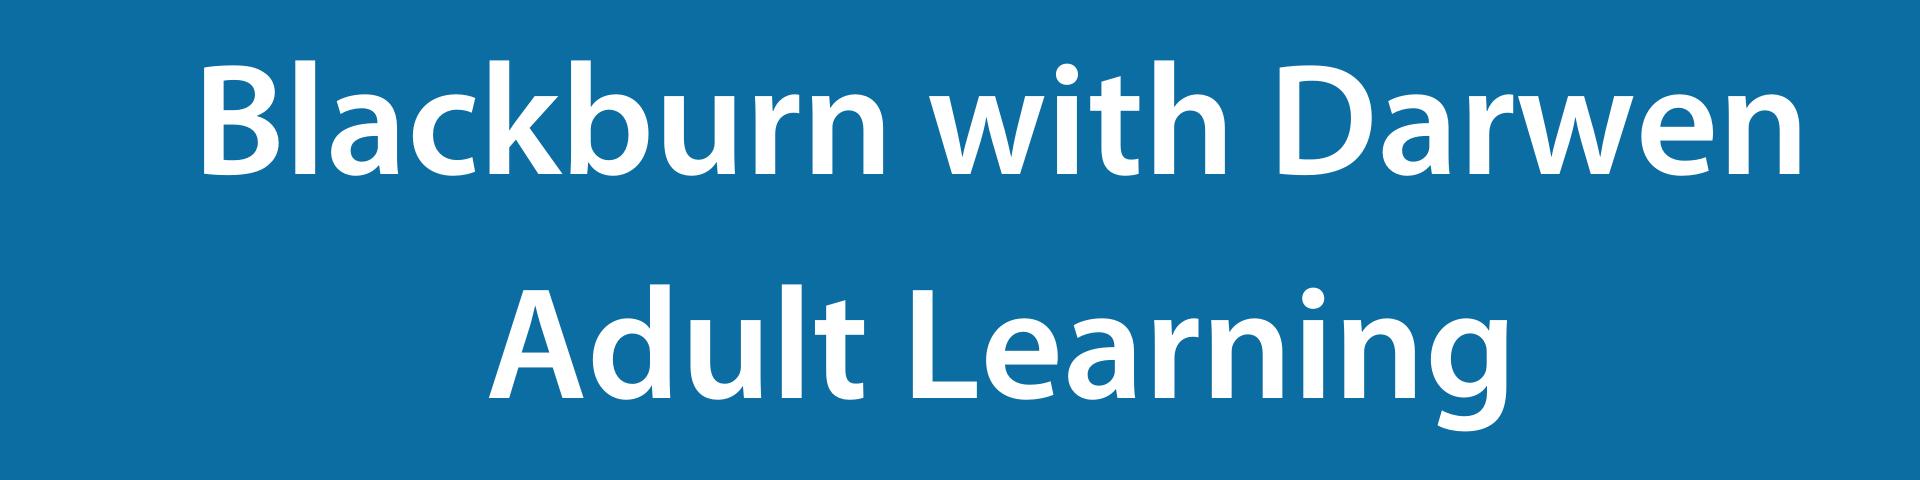 Blackburn with Darwen Adult Learning.